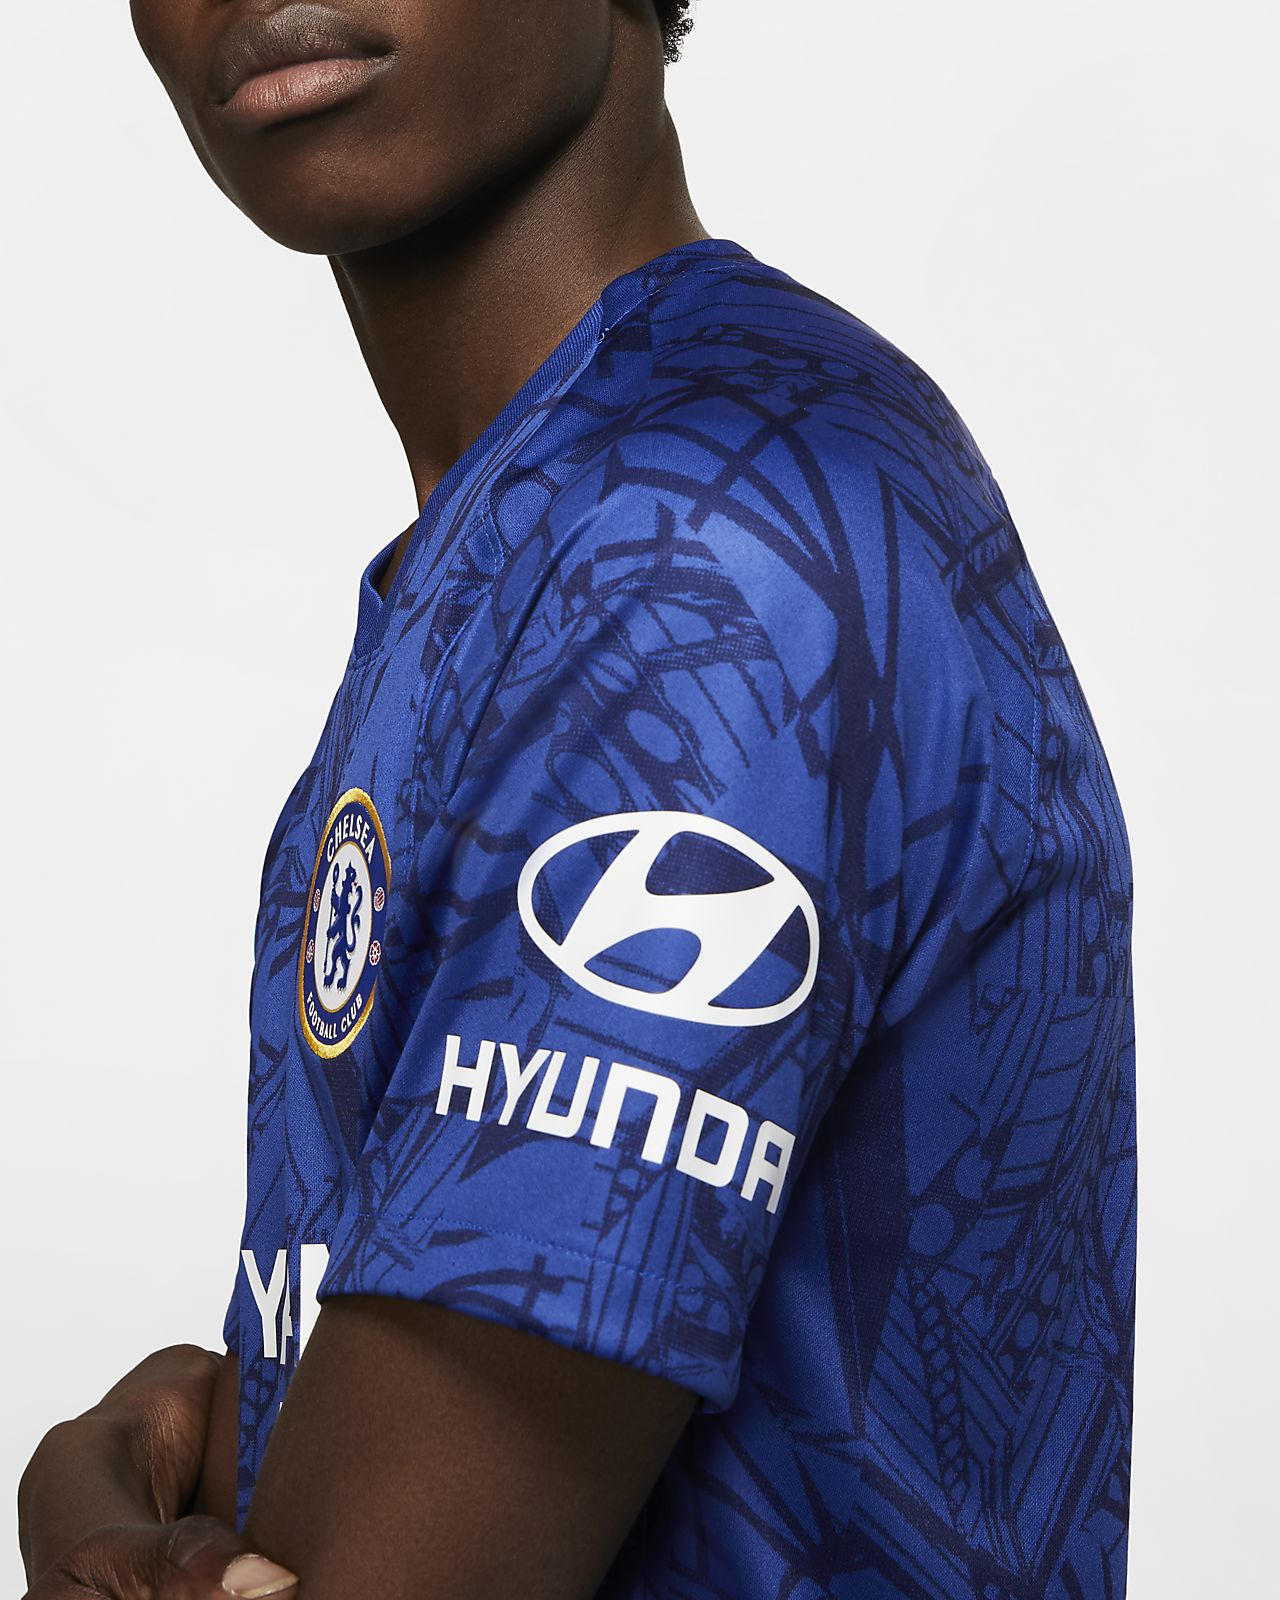 9dea772b5 Chelsea FC 2019 20 Stadium Home Men s Soccer Jersey. Nike.com